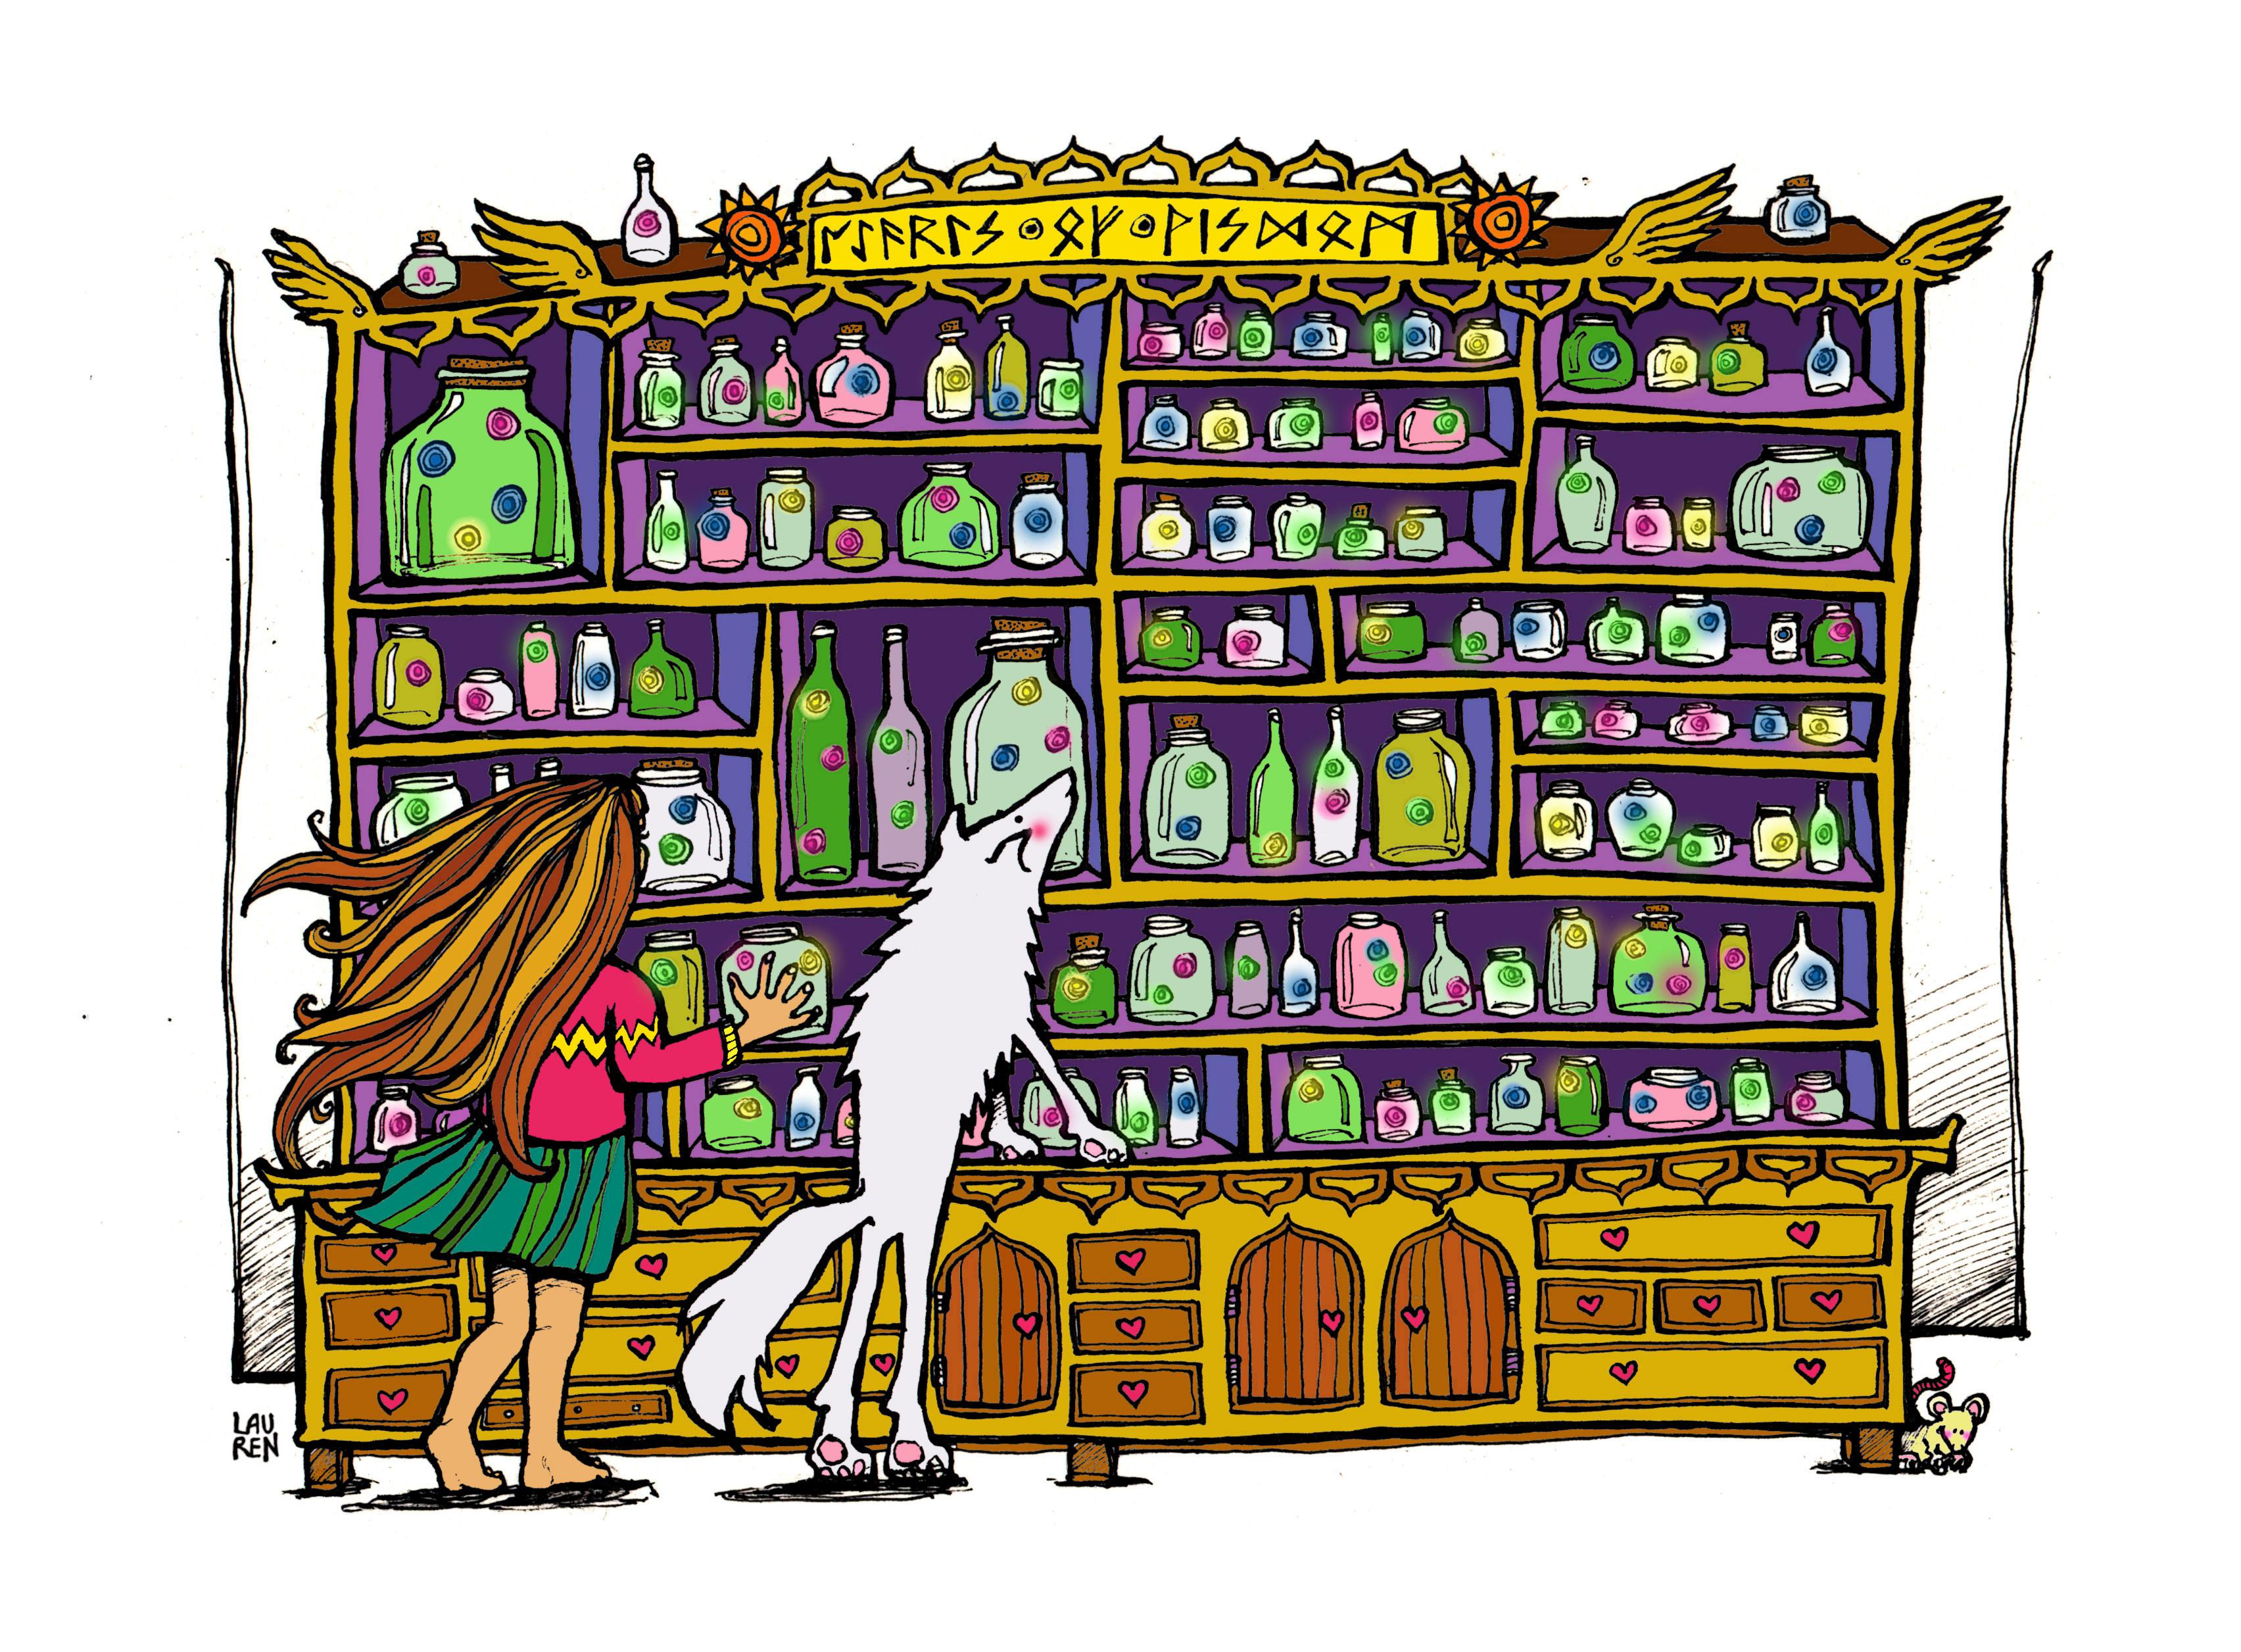 The Wisdom Repository (colourway)